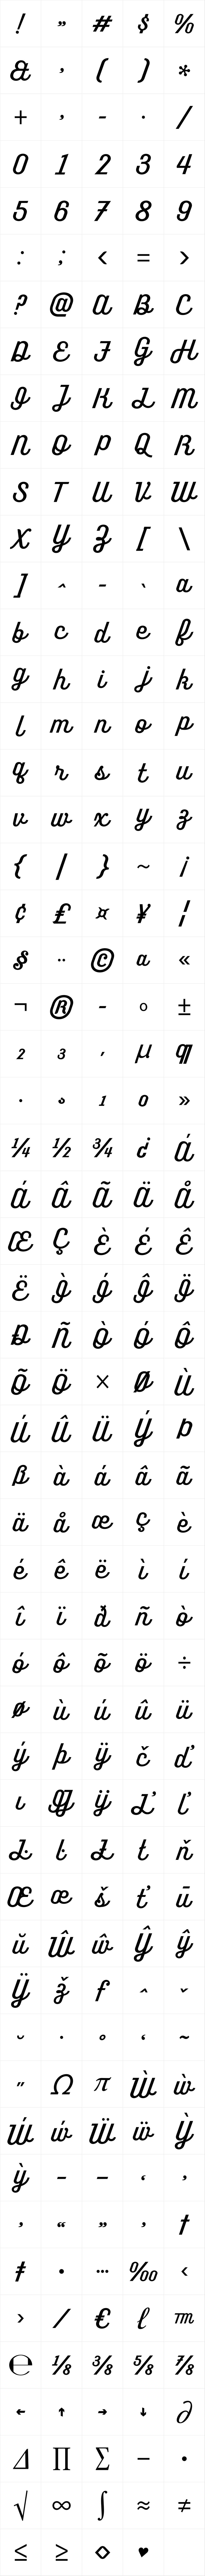 Benson Script No 30